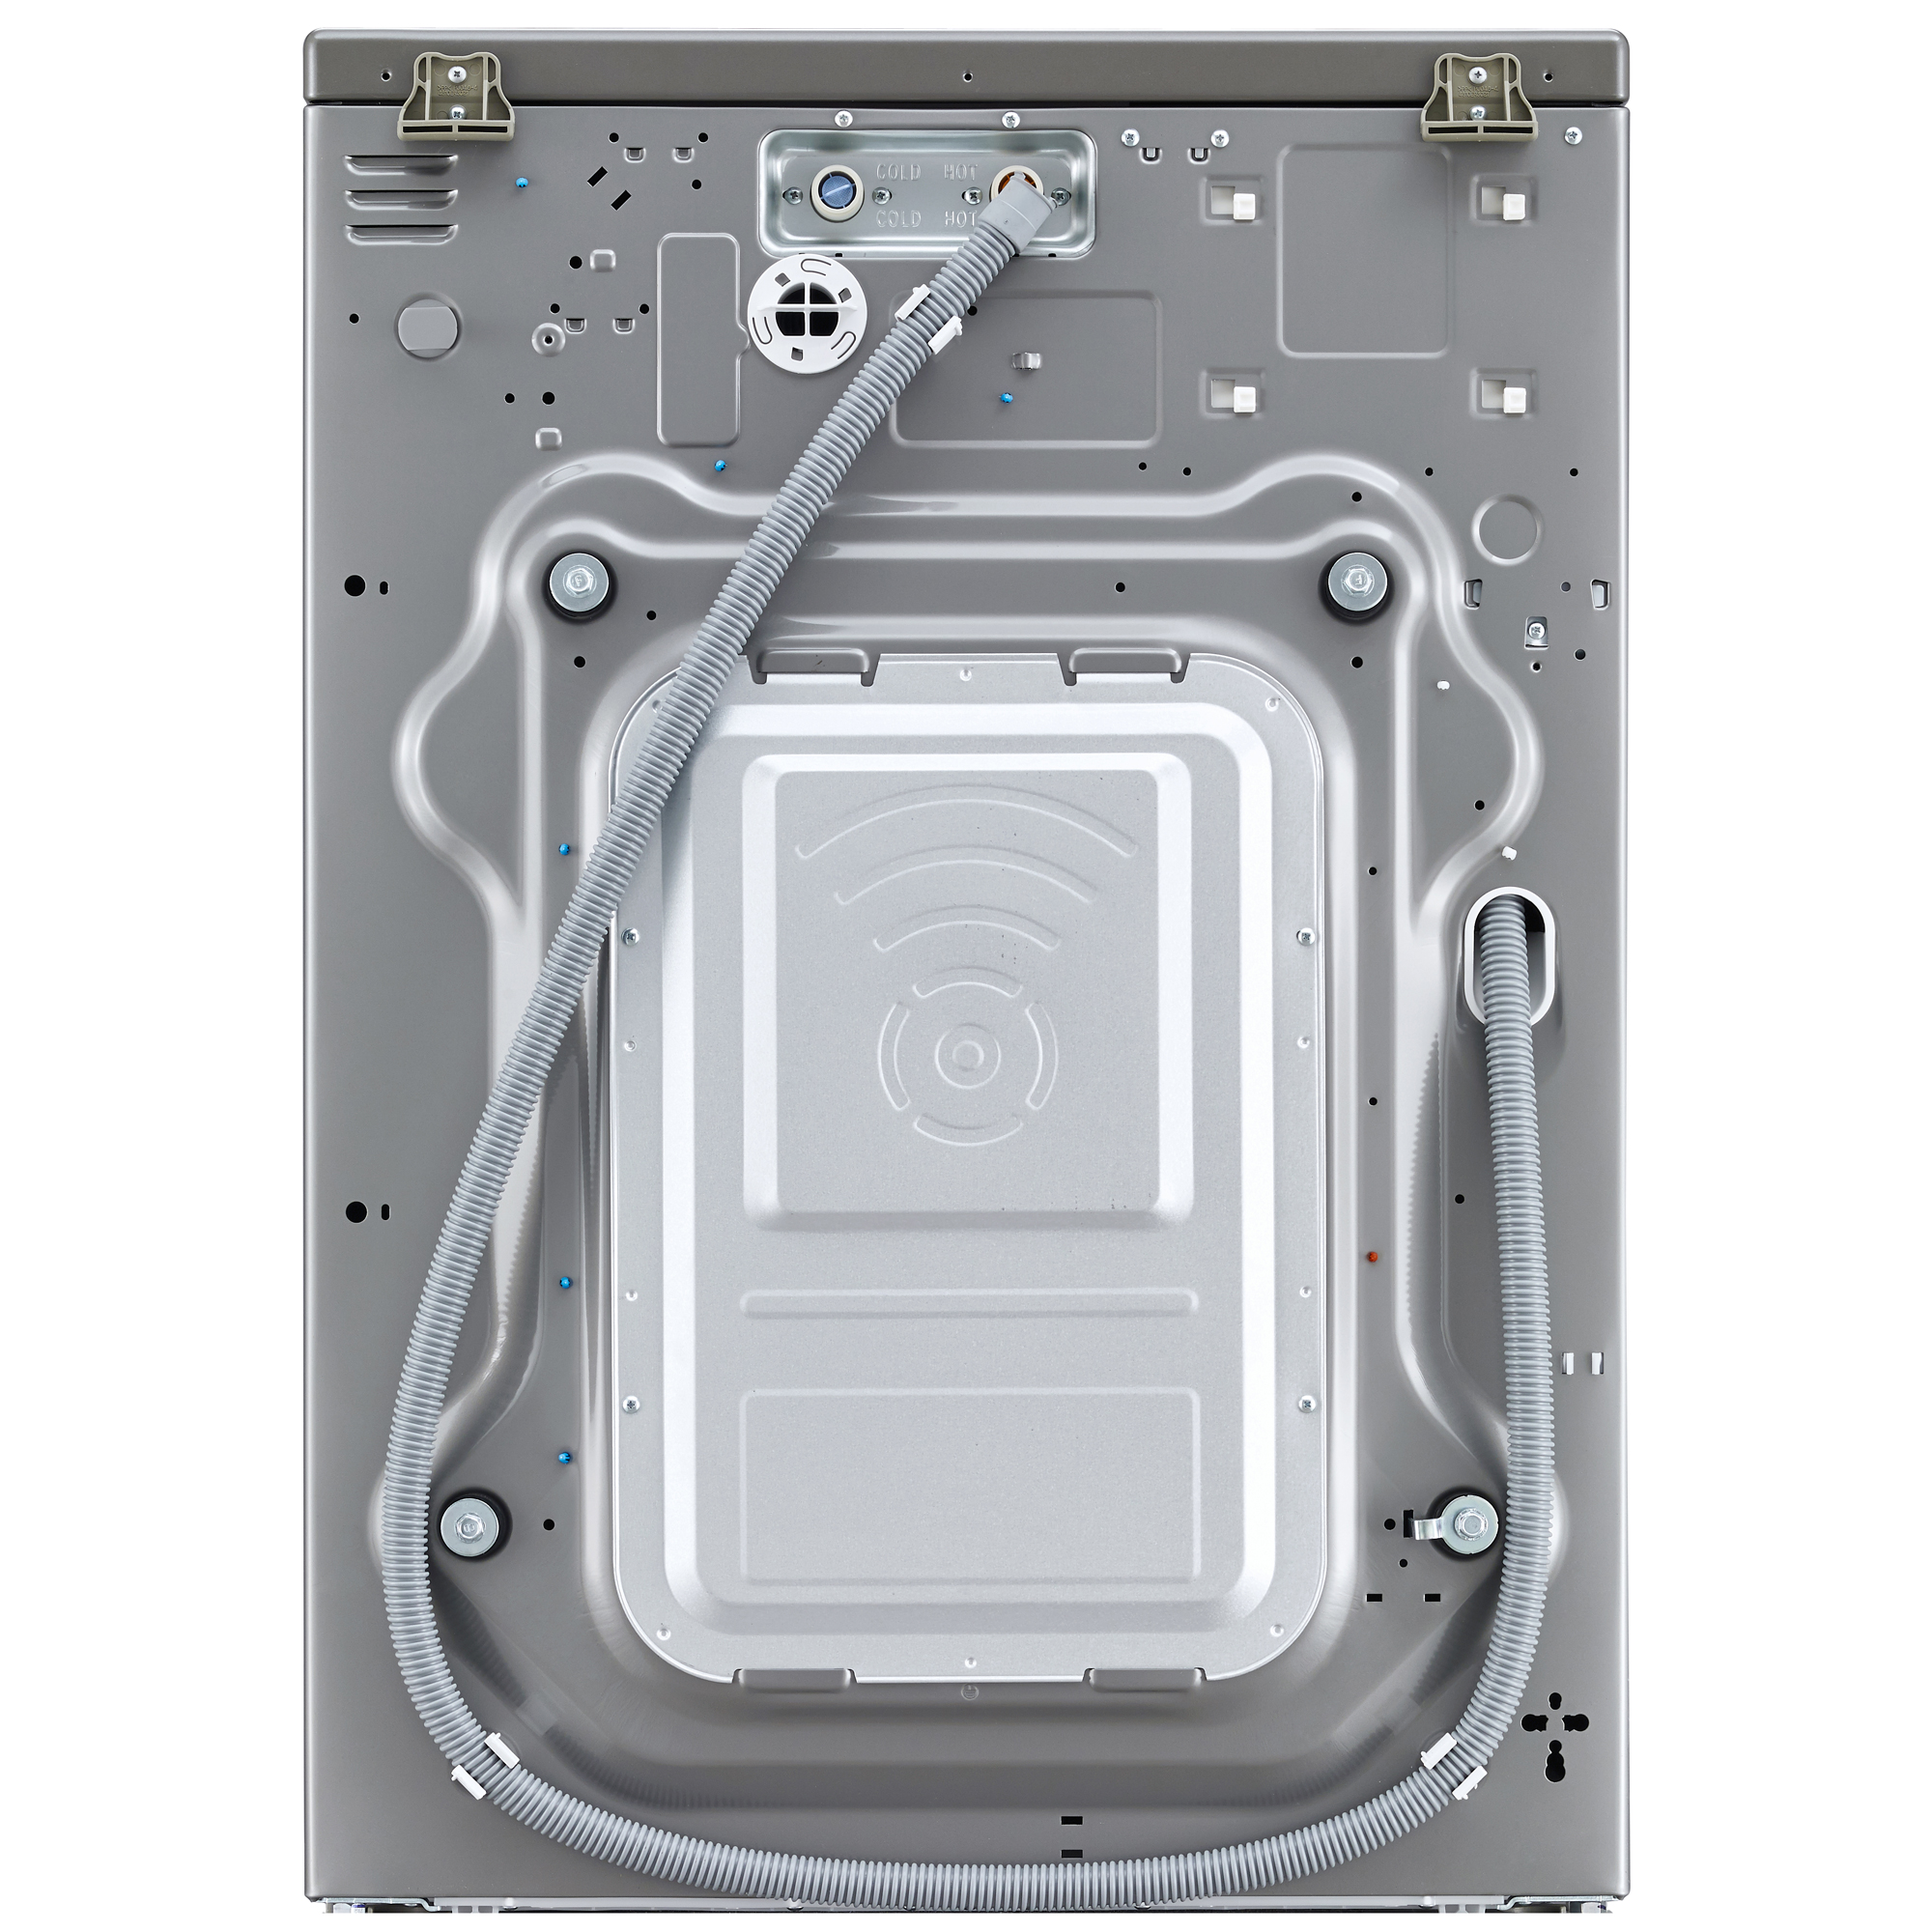 LG WM4270HVA 4.5 cu. ft. Front Load Washer w/ TurboWash™ Technology – Graphite Steel